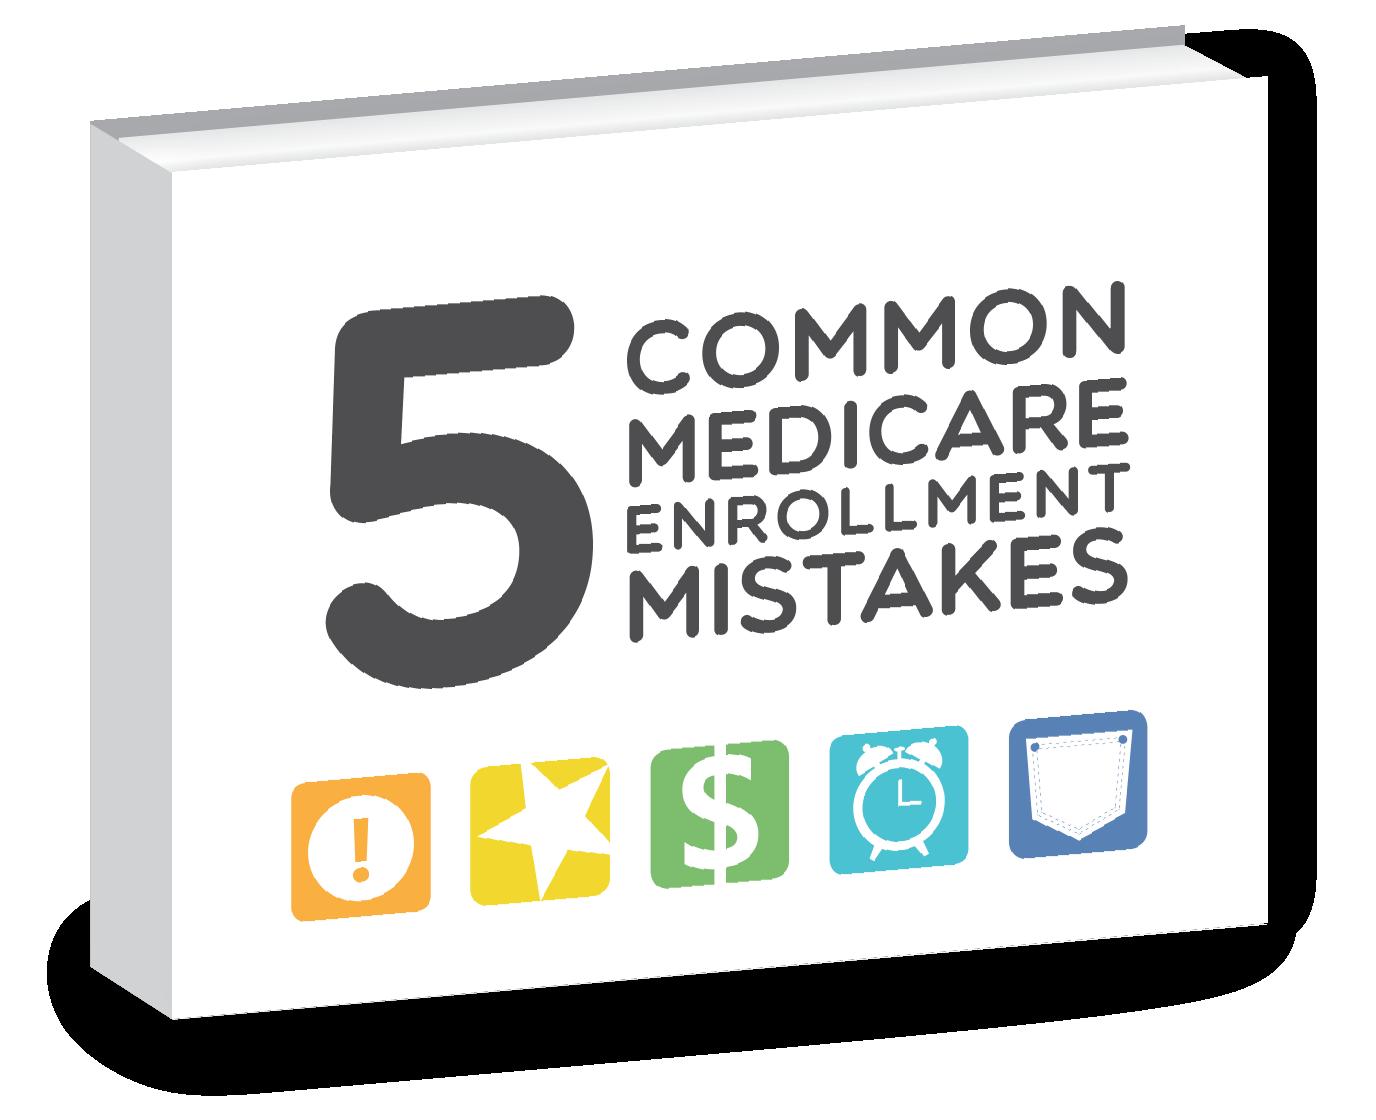 5 Common Medicare Enrollment Mistakes